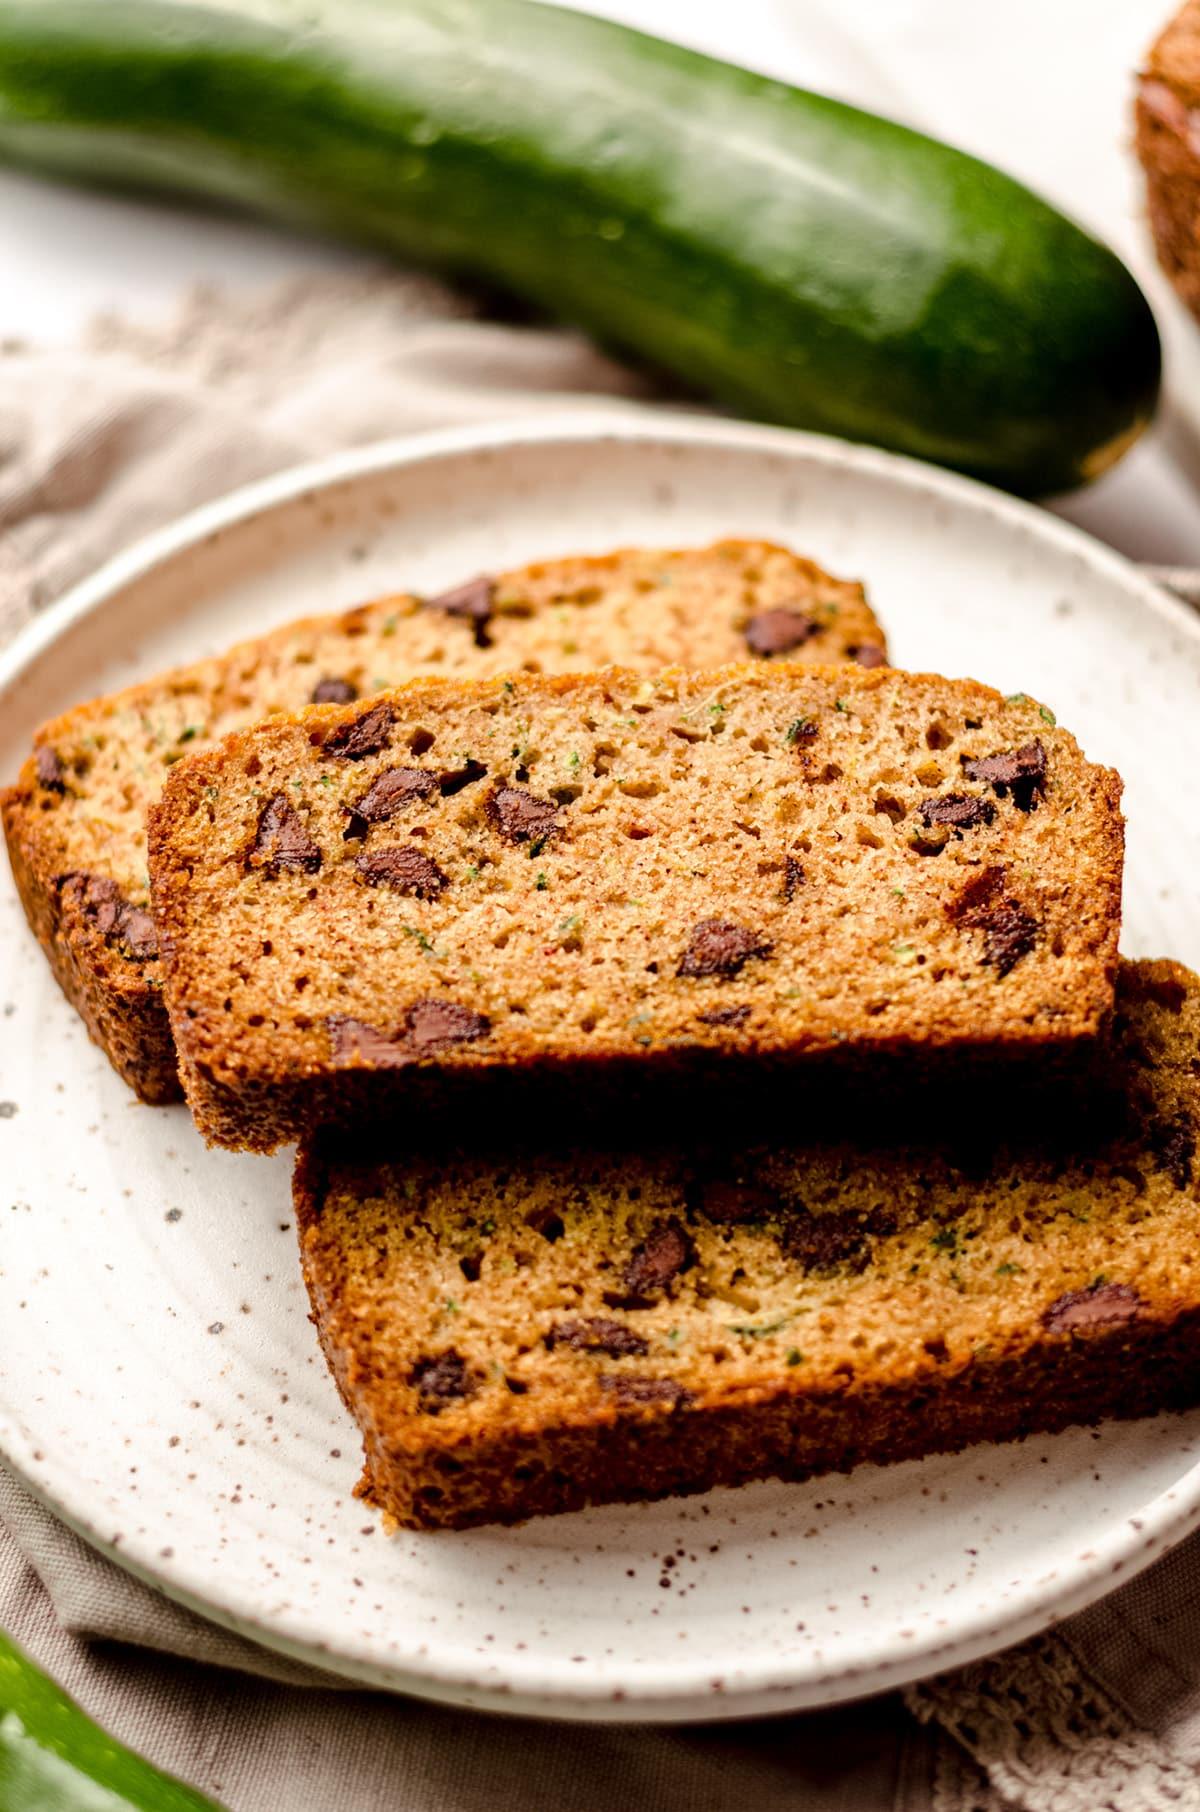 slices of chocolate chip zucchini bread